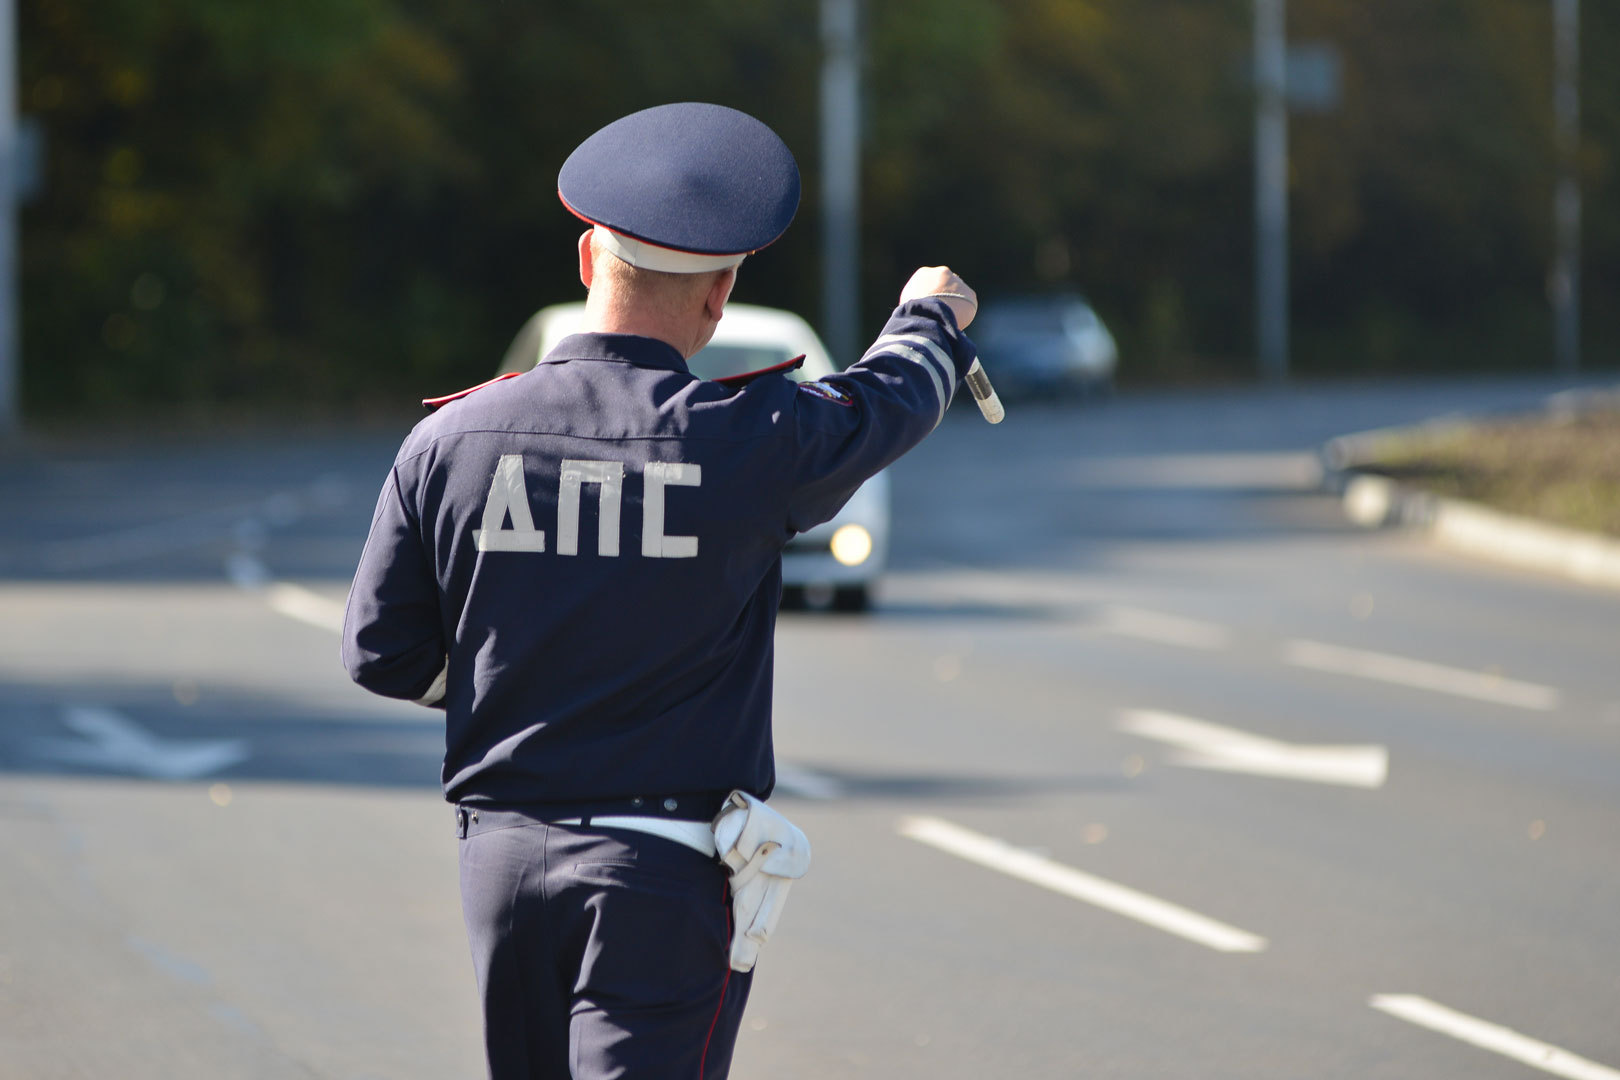 ВКочубеевском районе словили нетрезвого водителя на Лада Priora